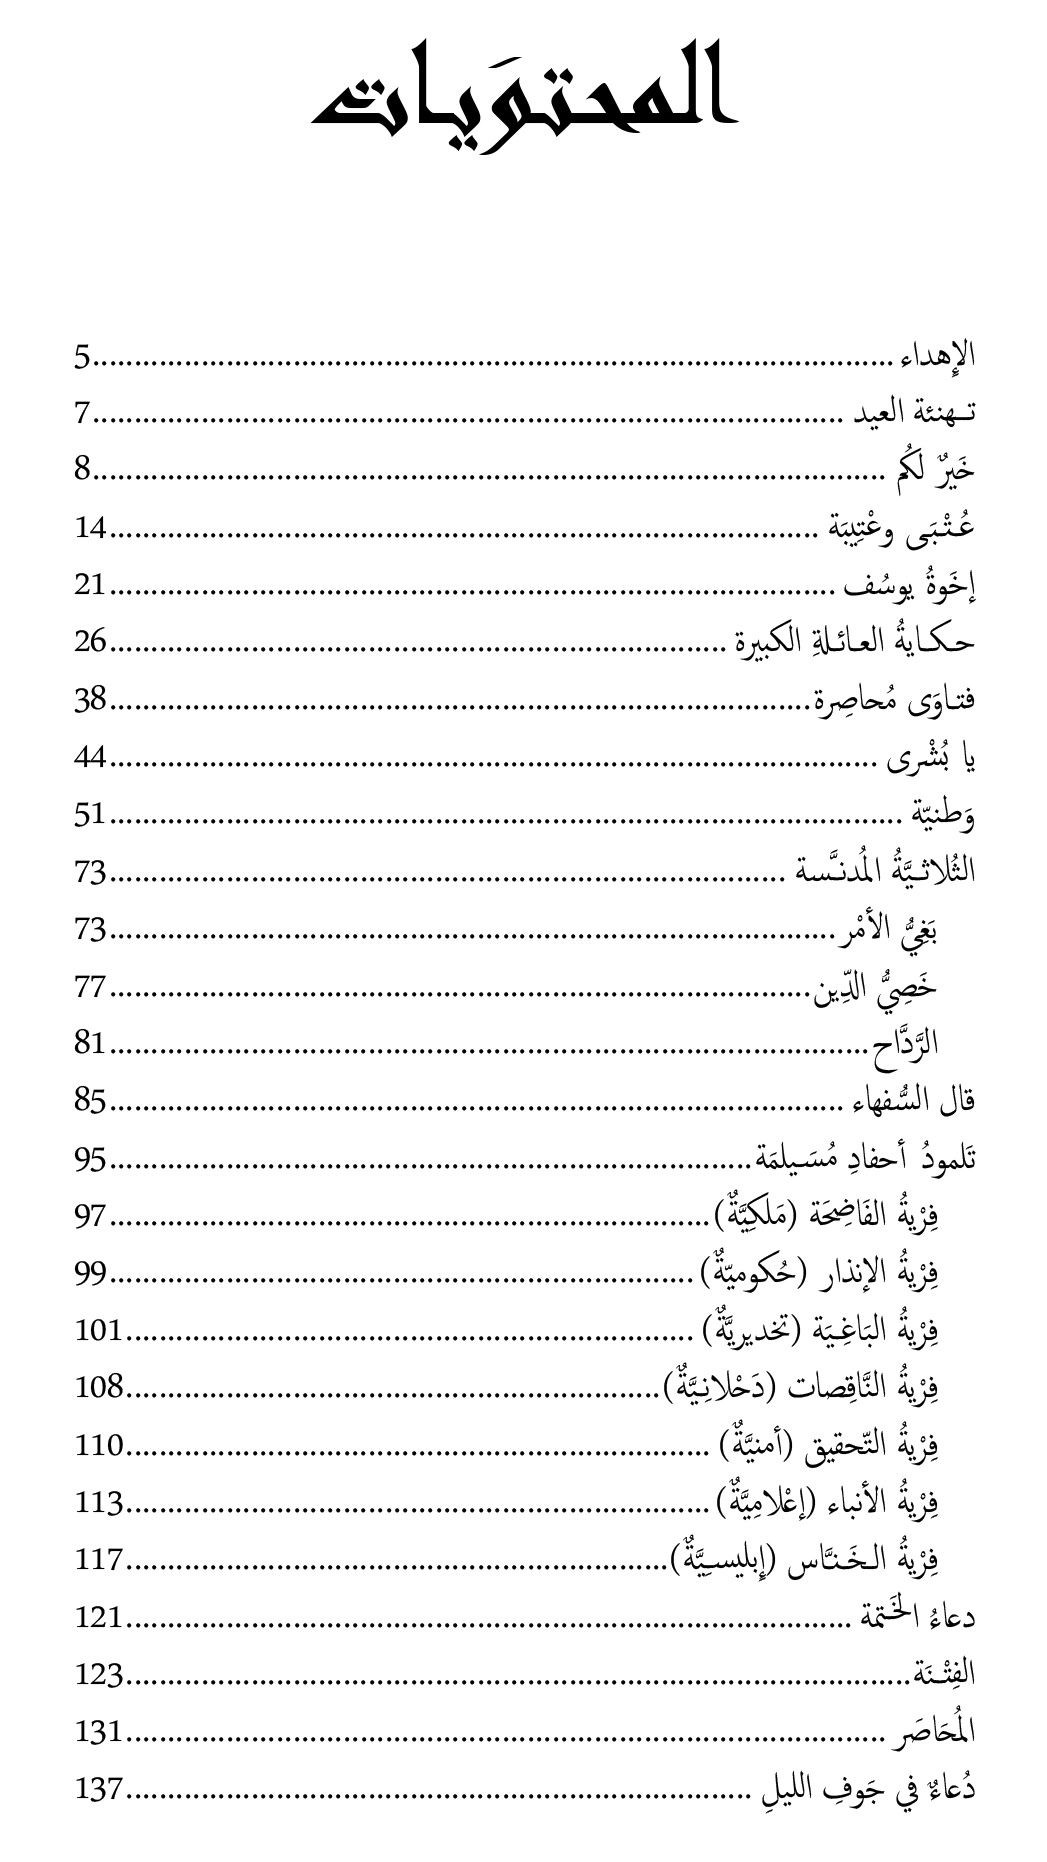 PoemsInTimeOfSiege BookContents KhalidAlMahmoud